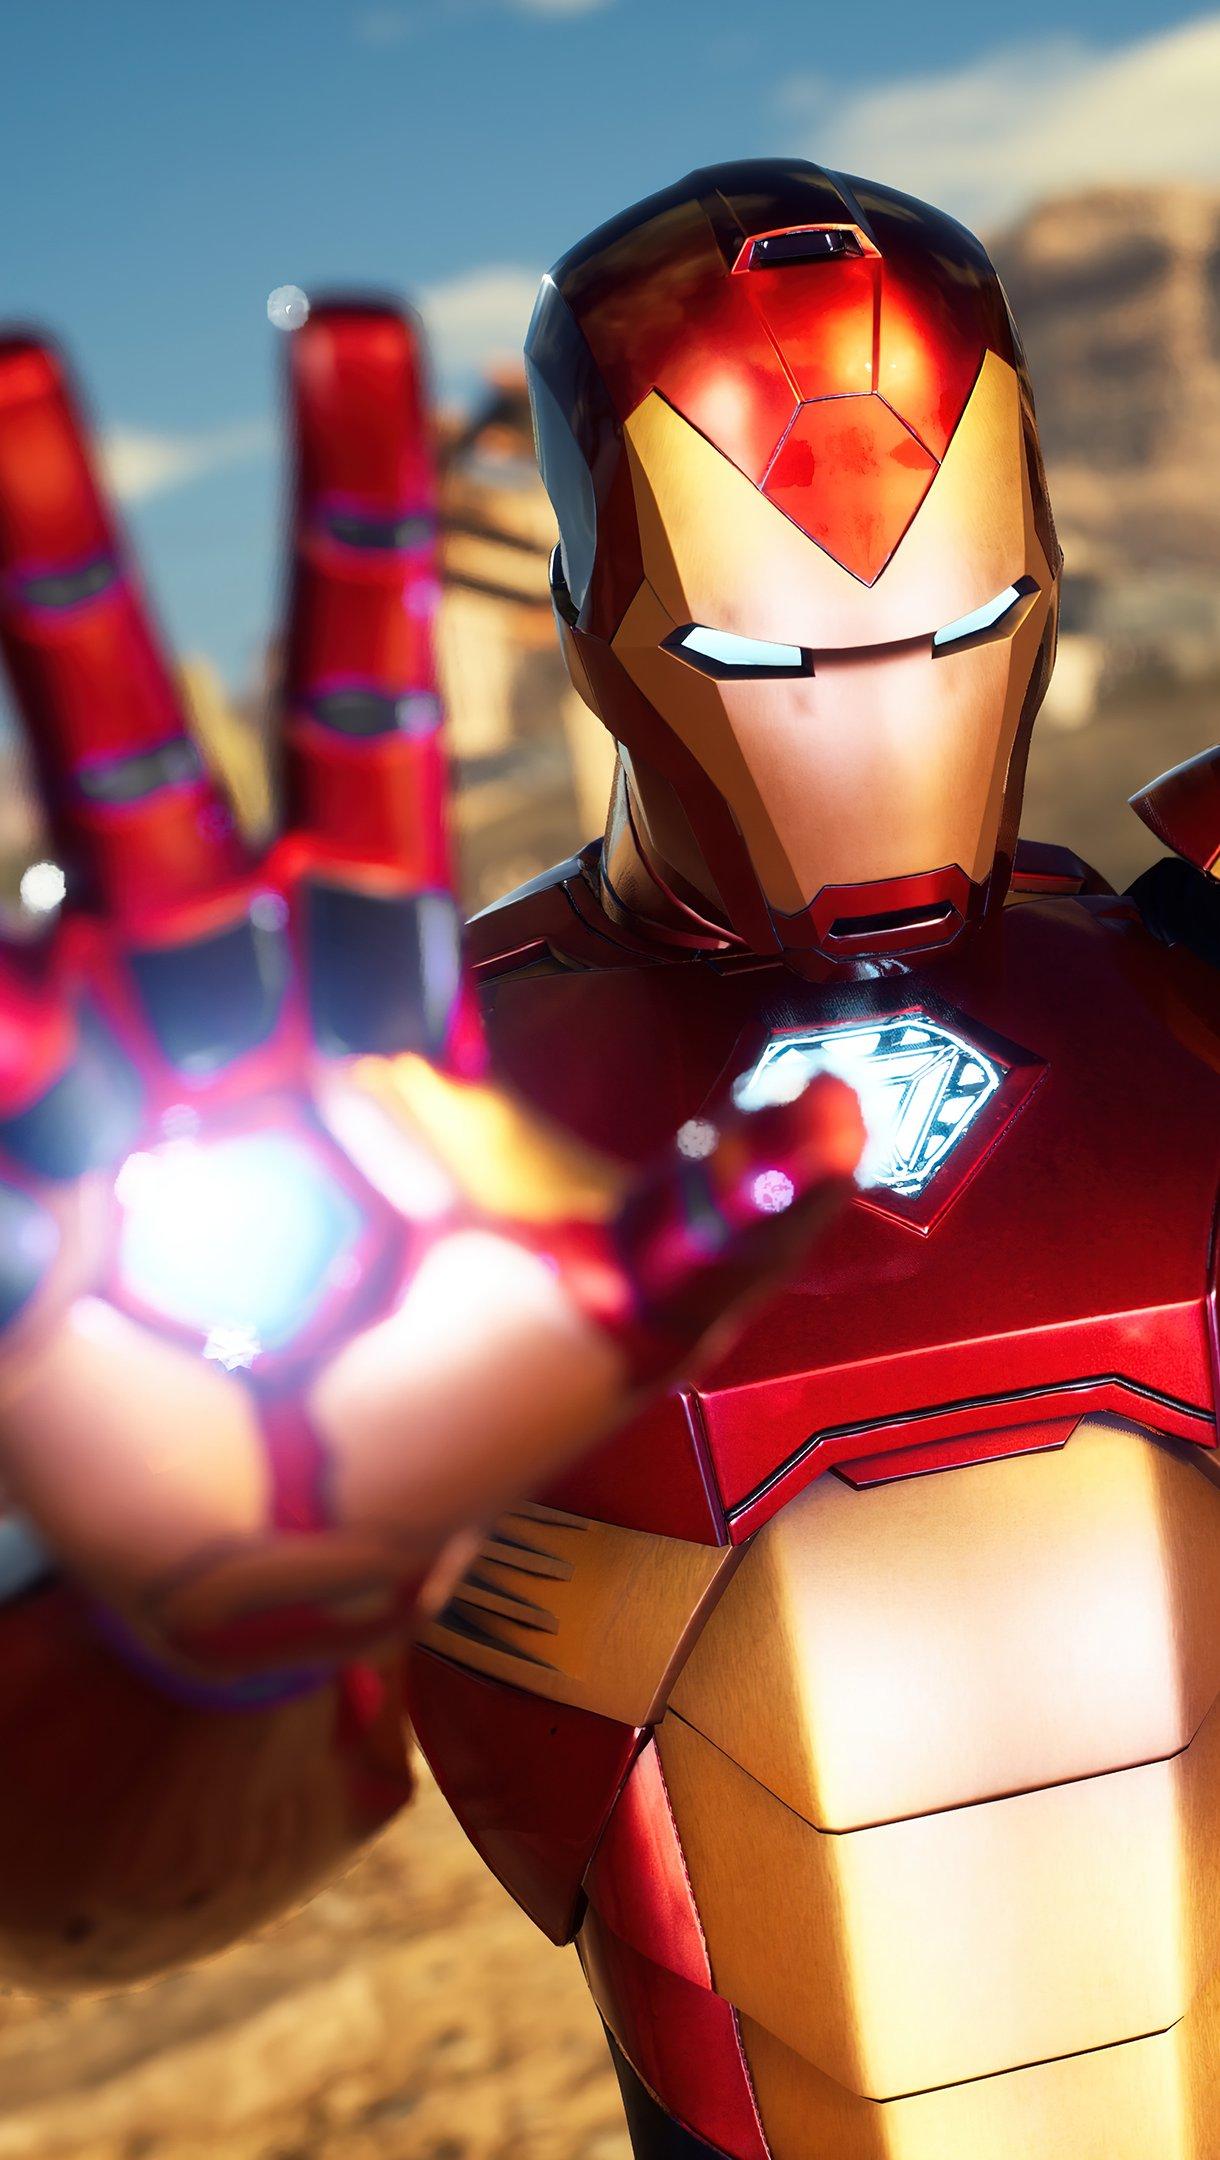 Fondos de pantalla Iron Man Marvel's Midnight suns Vertical